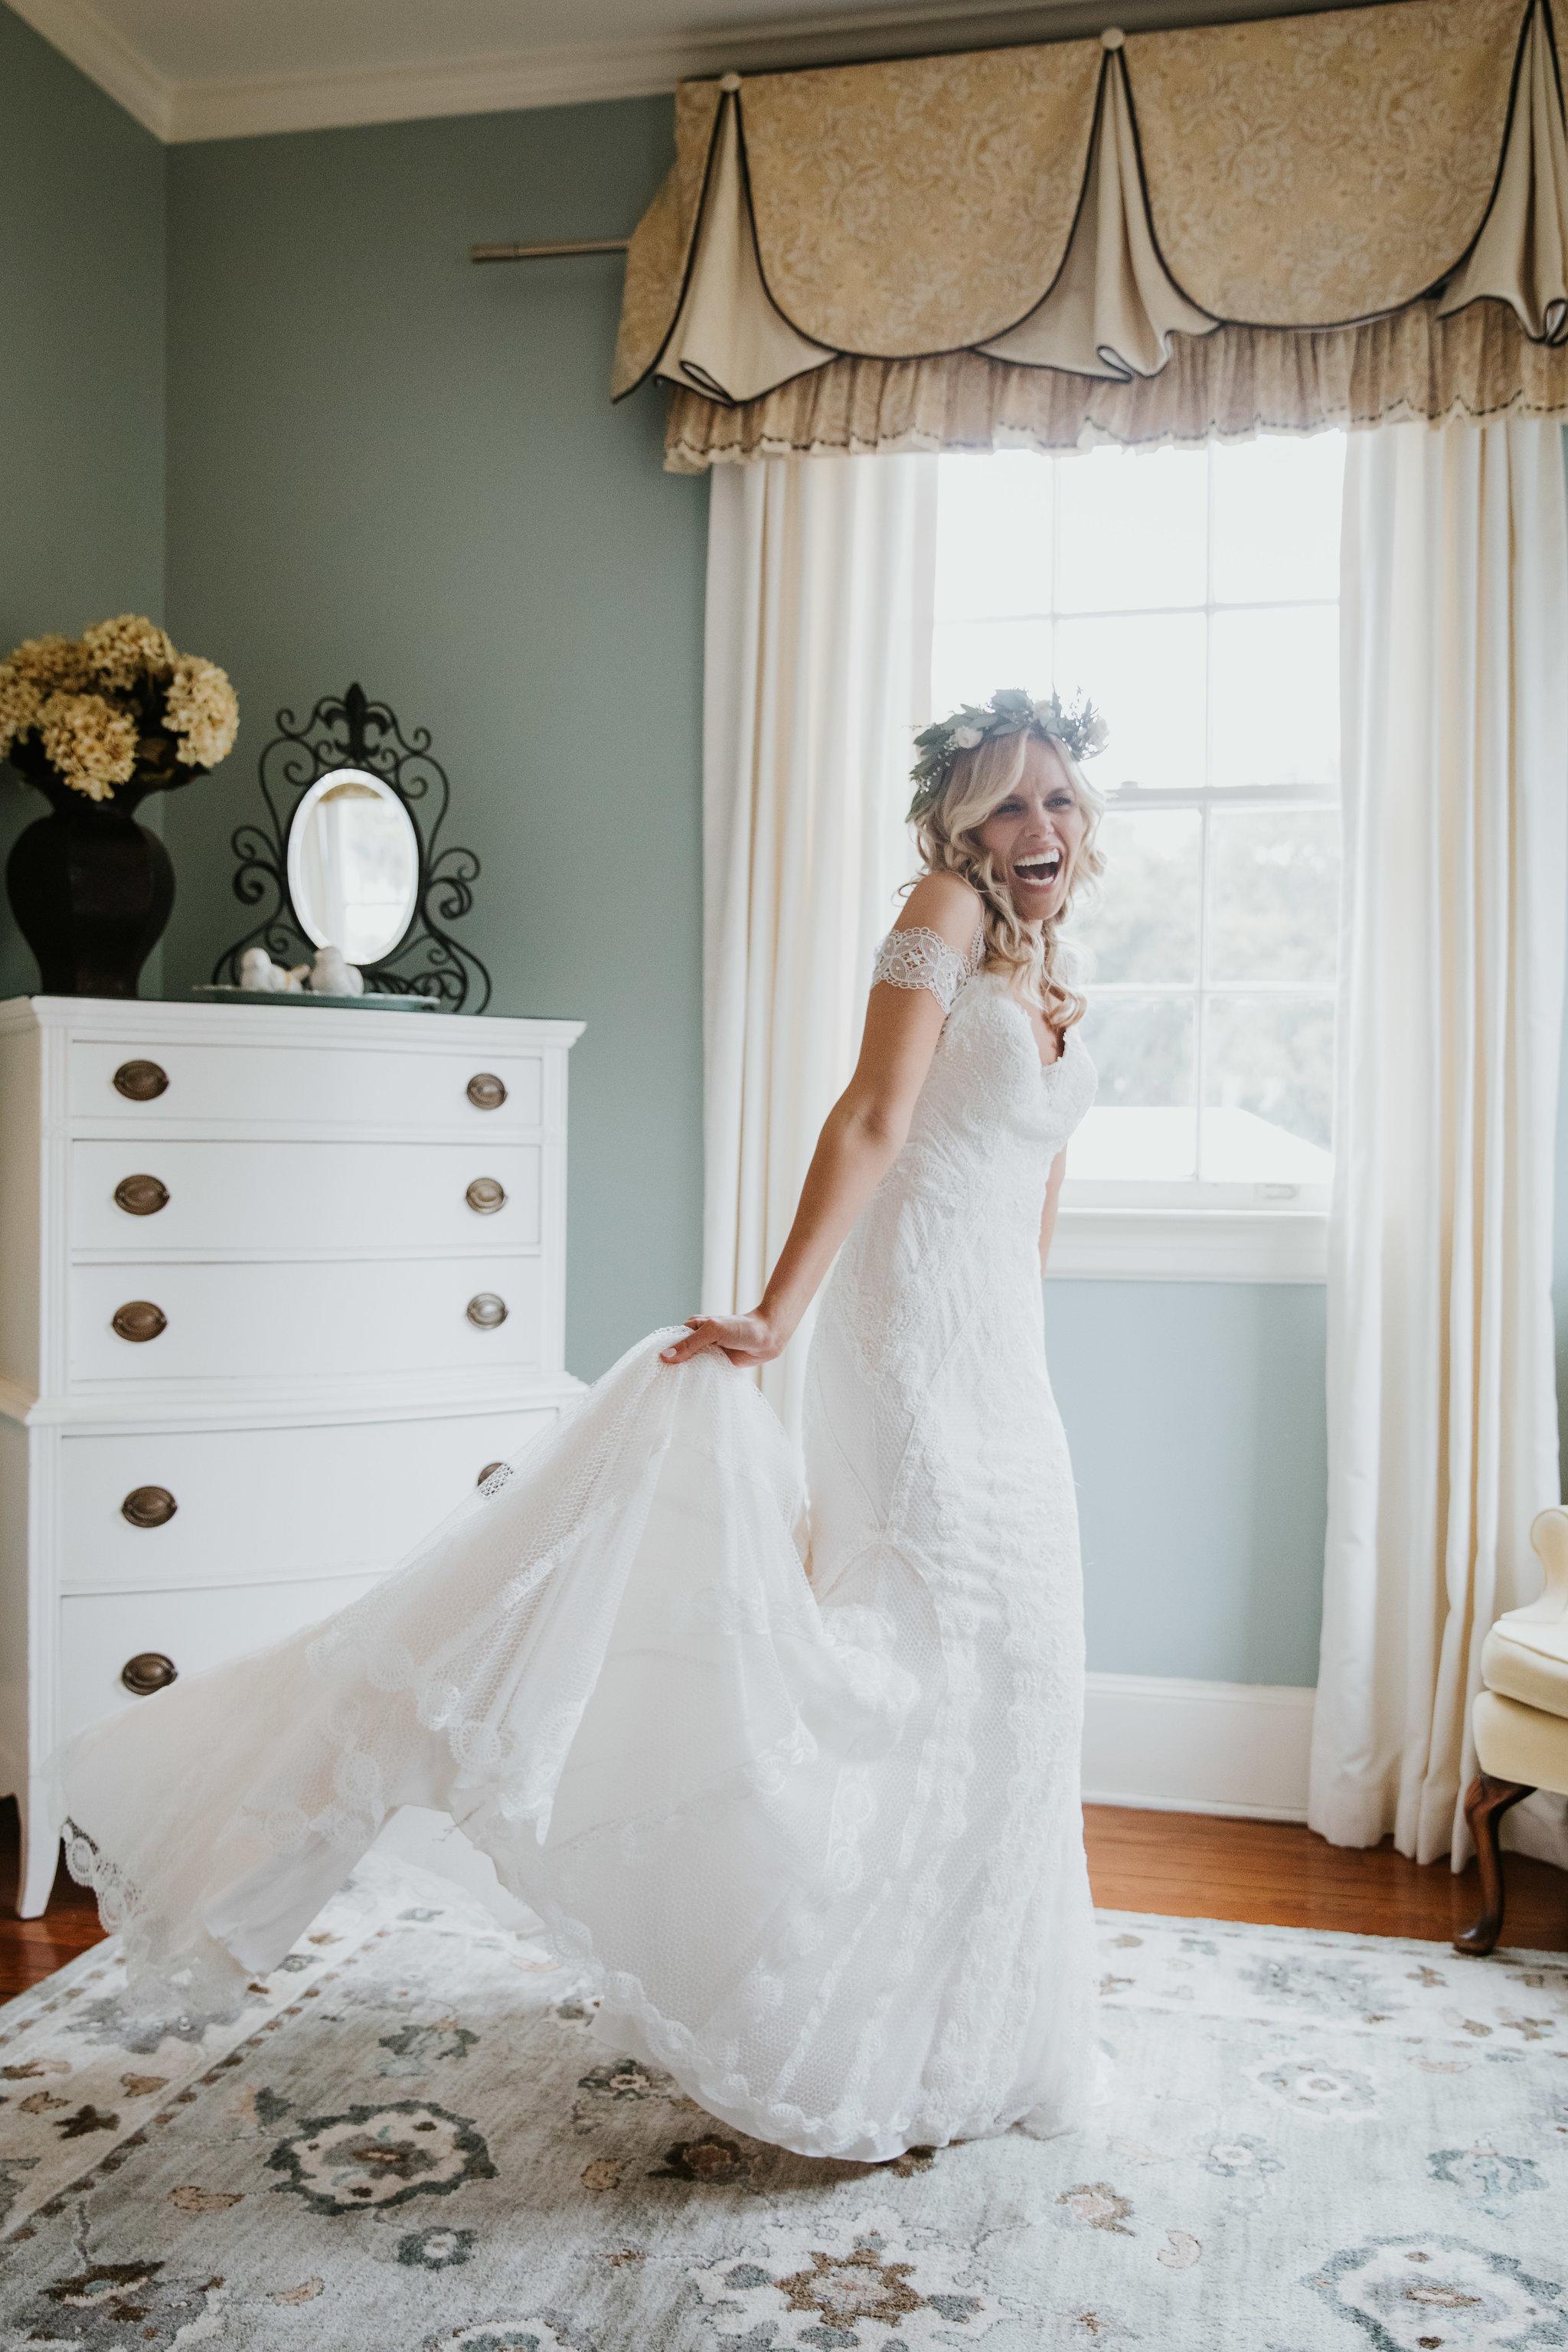 Legare-Waring-House-Charleston-SC-wedding-portrait-photography-210.jpg